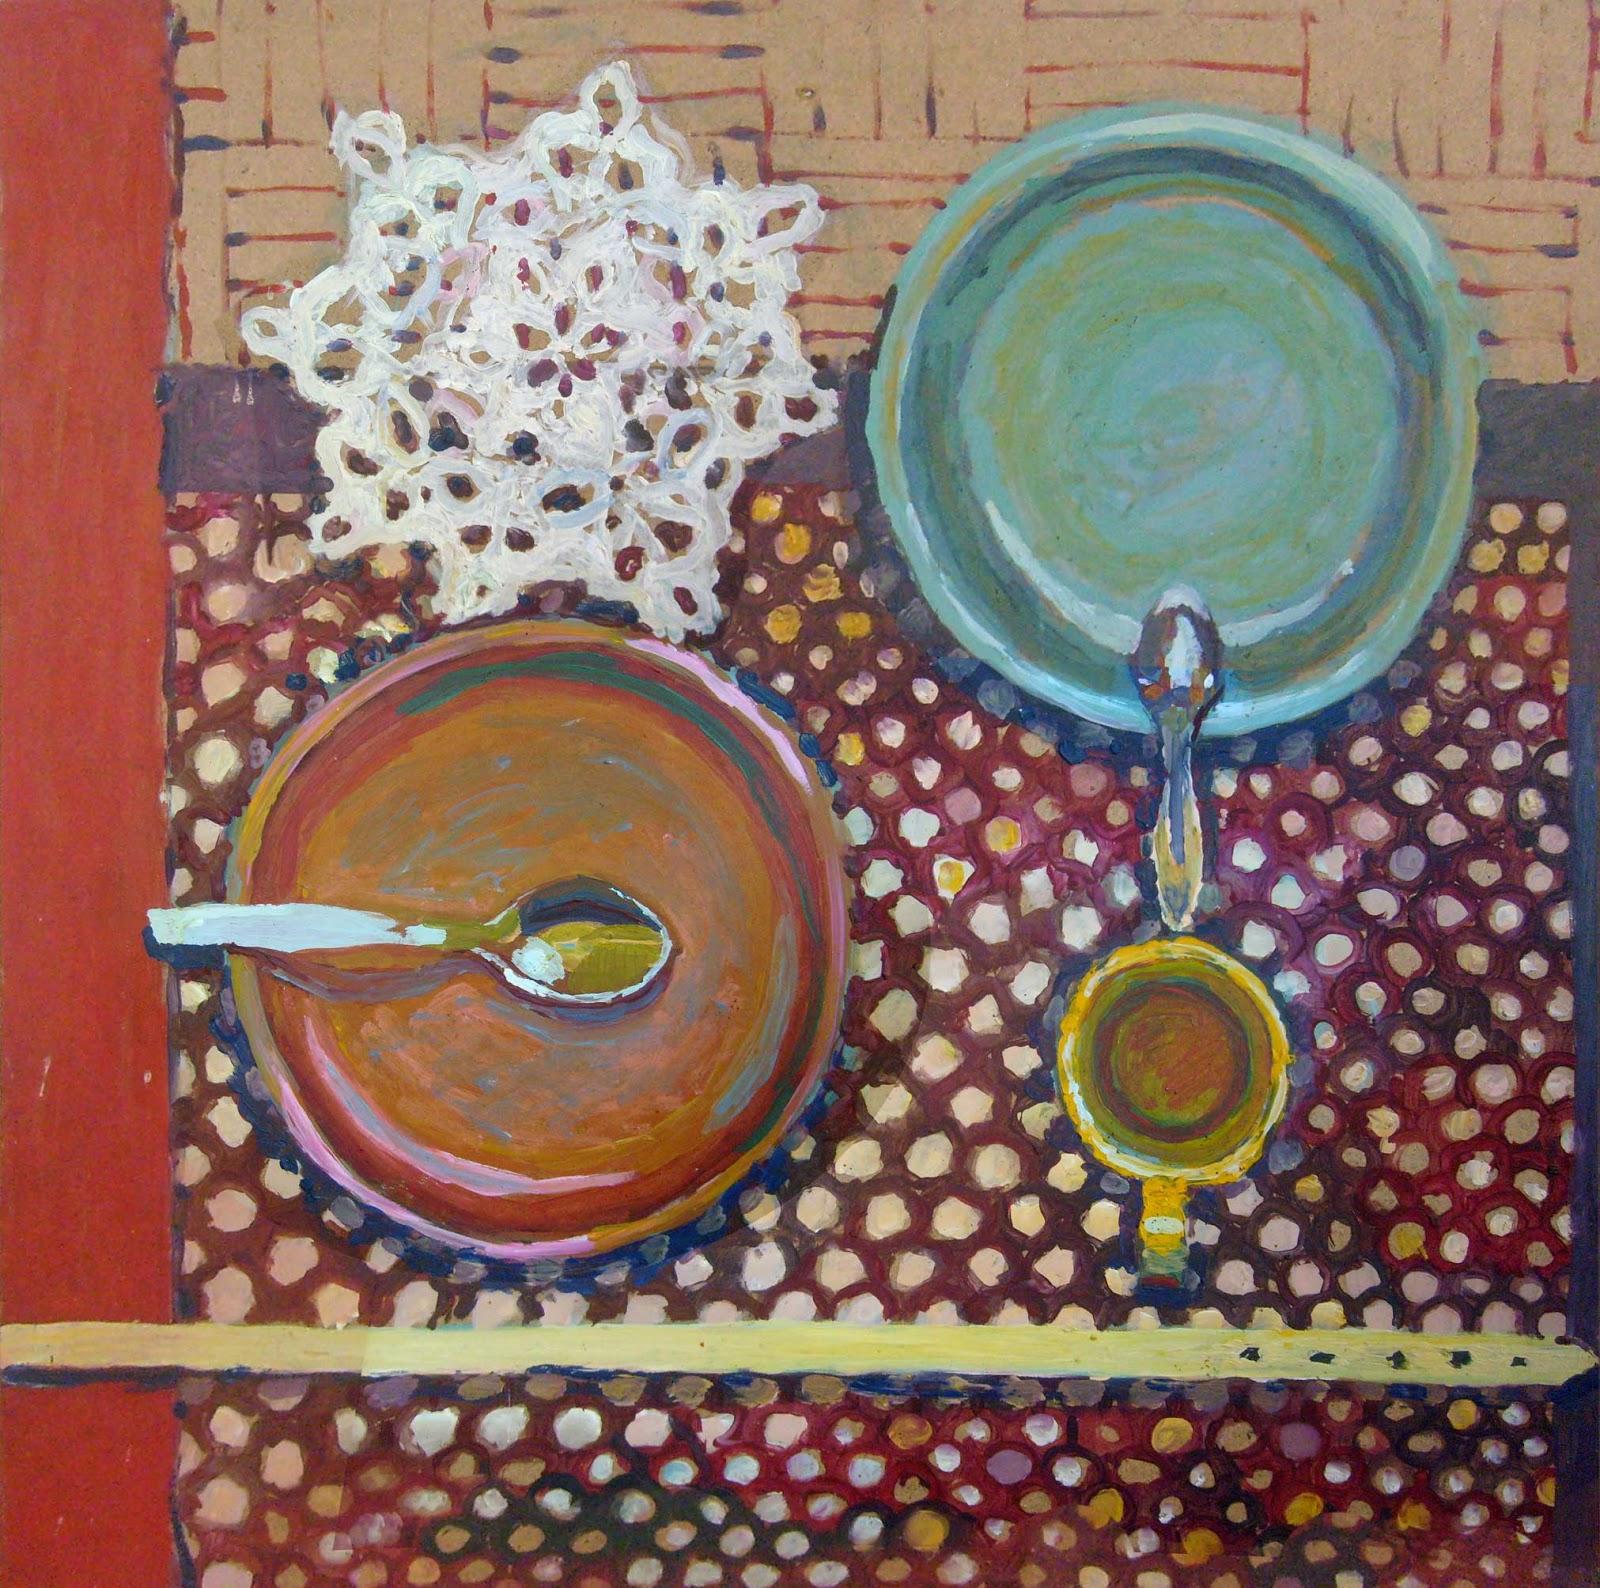 compositions of porcelain still life paint plates kitchen